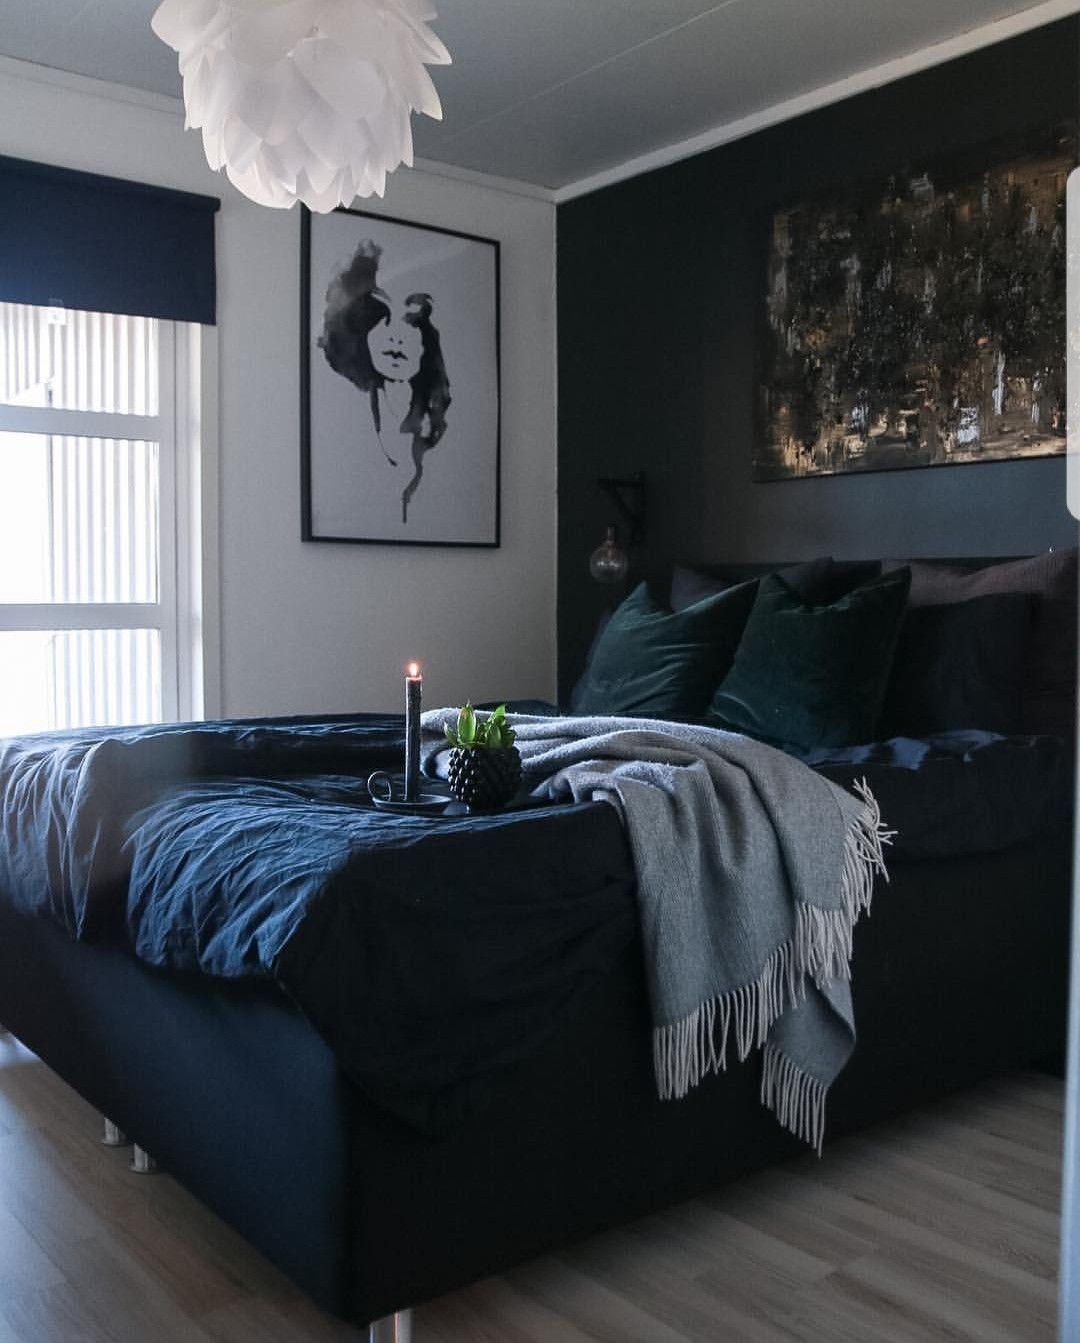 Pin By Celine Cevy Dahl On Dark Maskulin Lounge Bedroom Decor Home Decor Bedroom Bedroom Interior Modern bedroom maskulin design